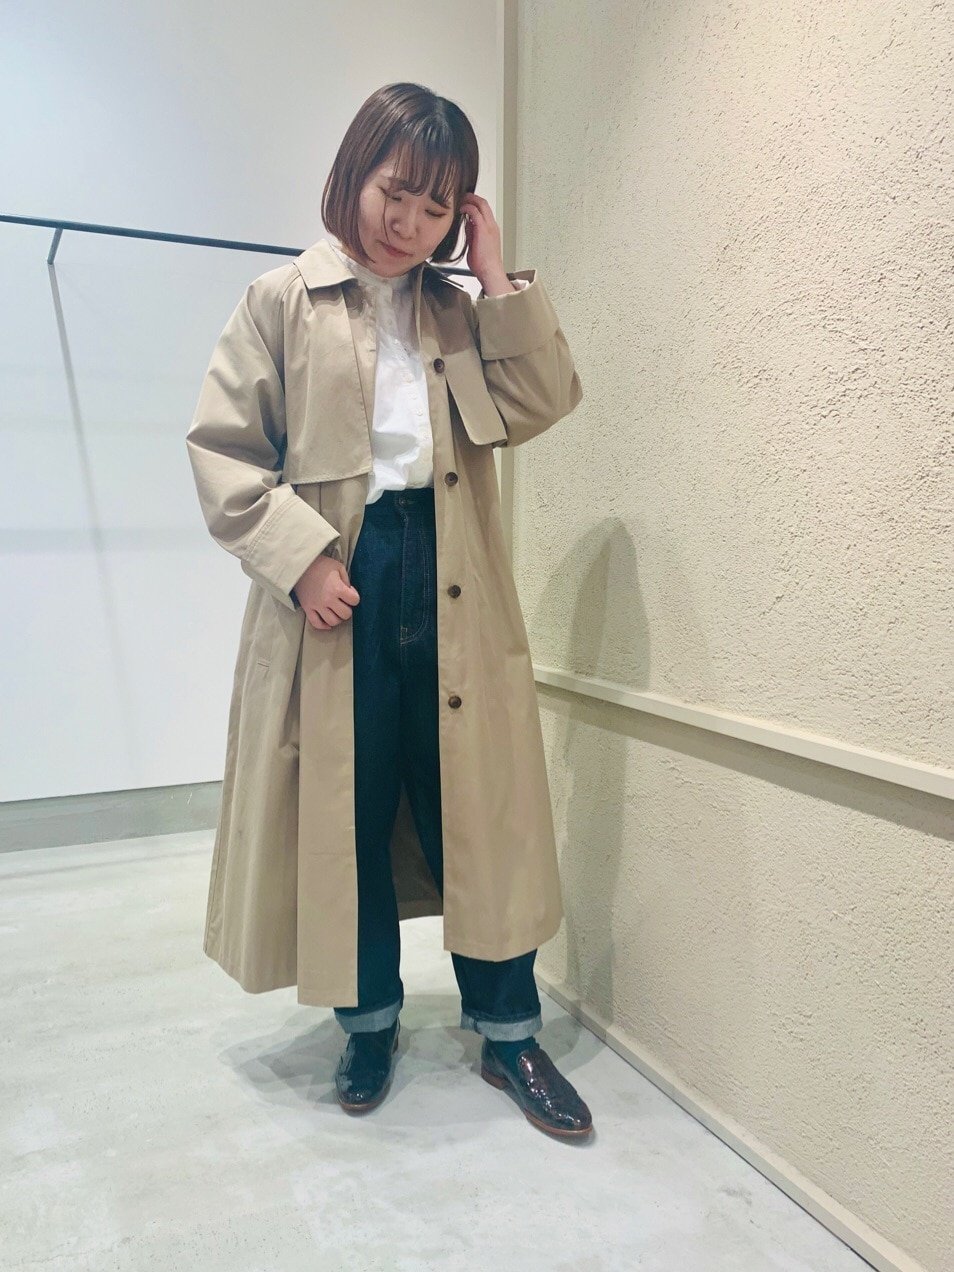 chambre de charme 横浜ジョイナス 身長:155cm 2020.11.11